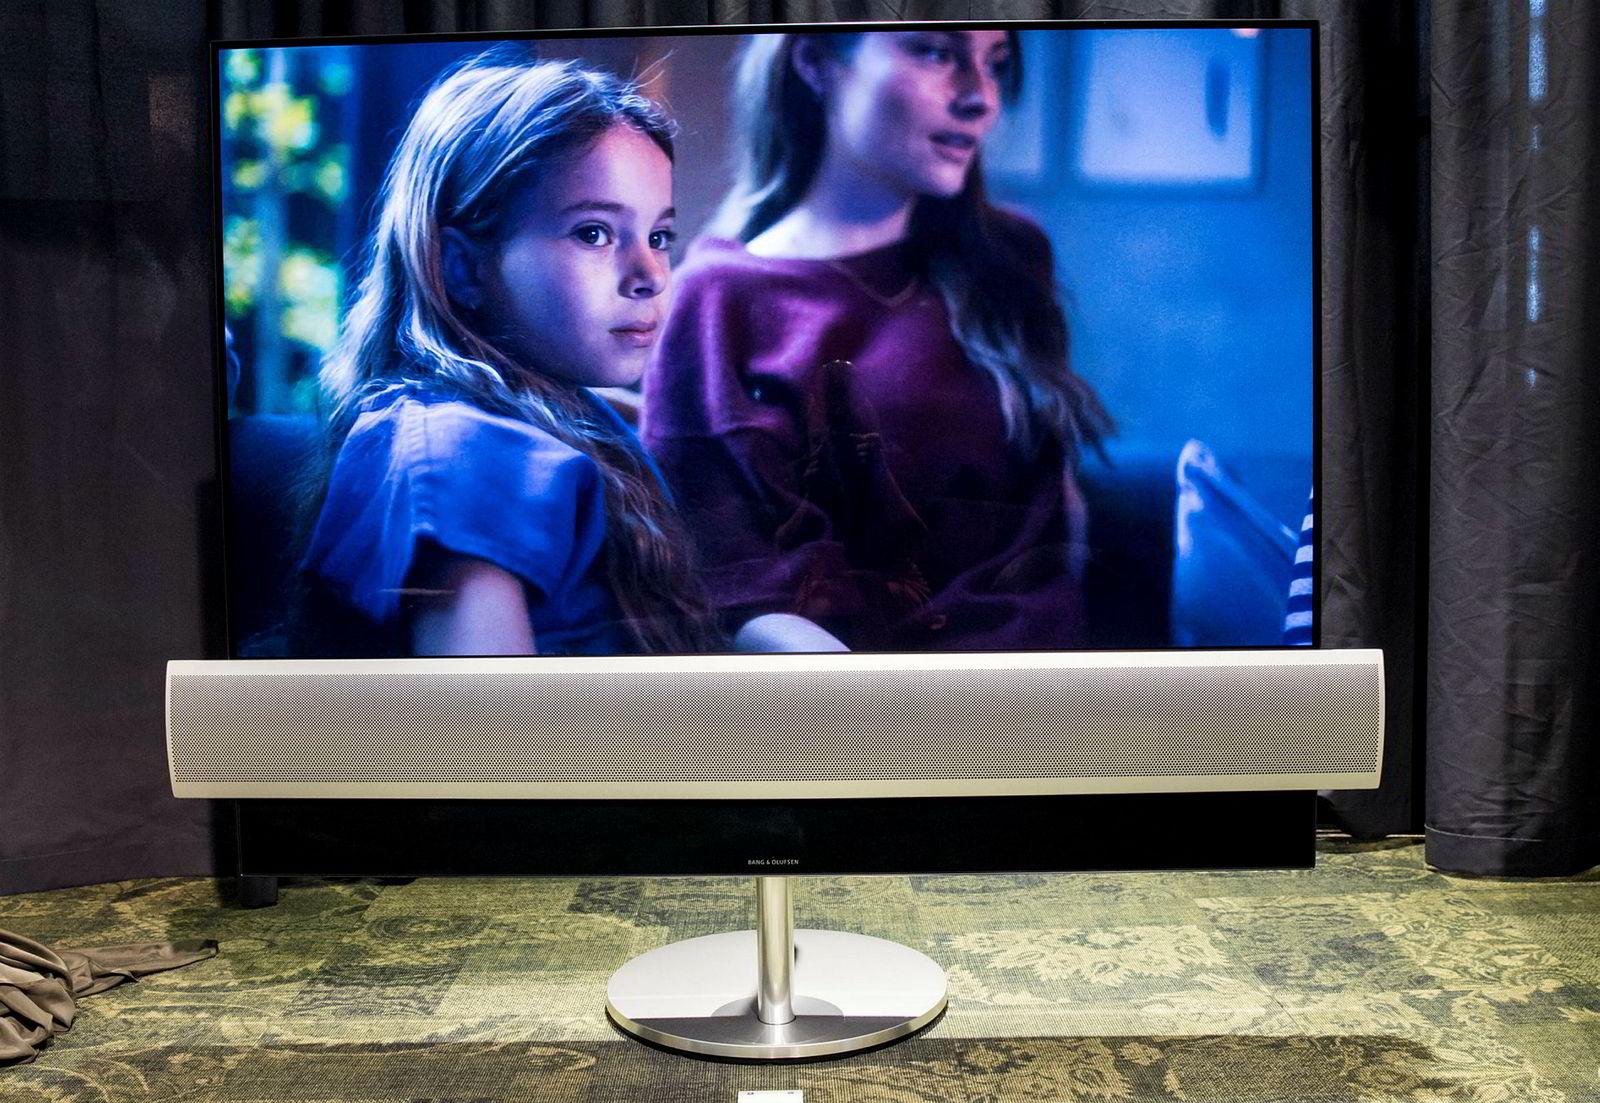 Bang & Olufsen Eclipse kombinerer LGs beste billedkvalitet og Bang & Olufsens hittil beste tv-lyd.